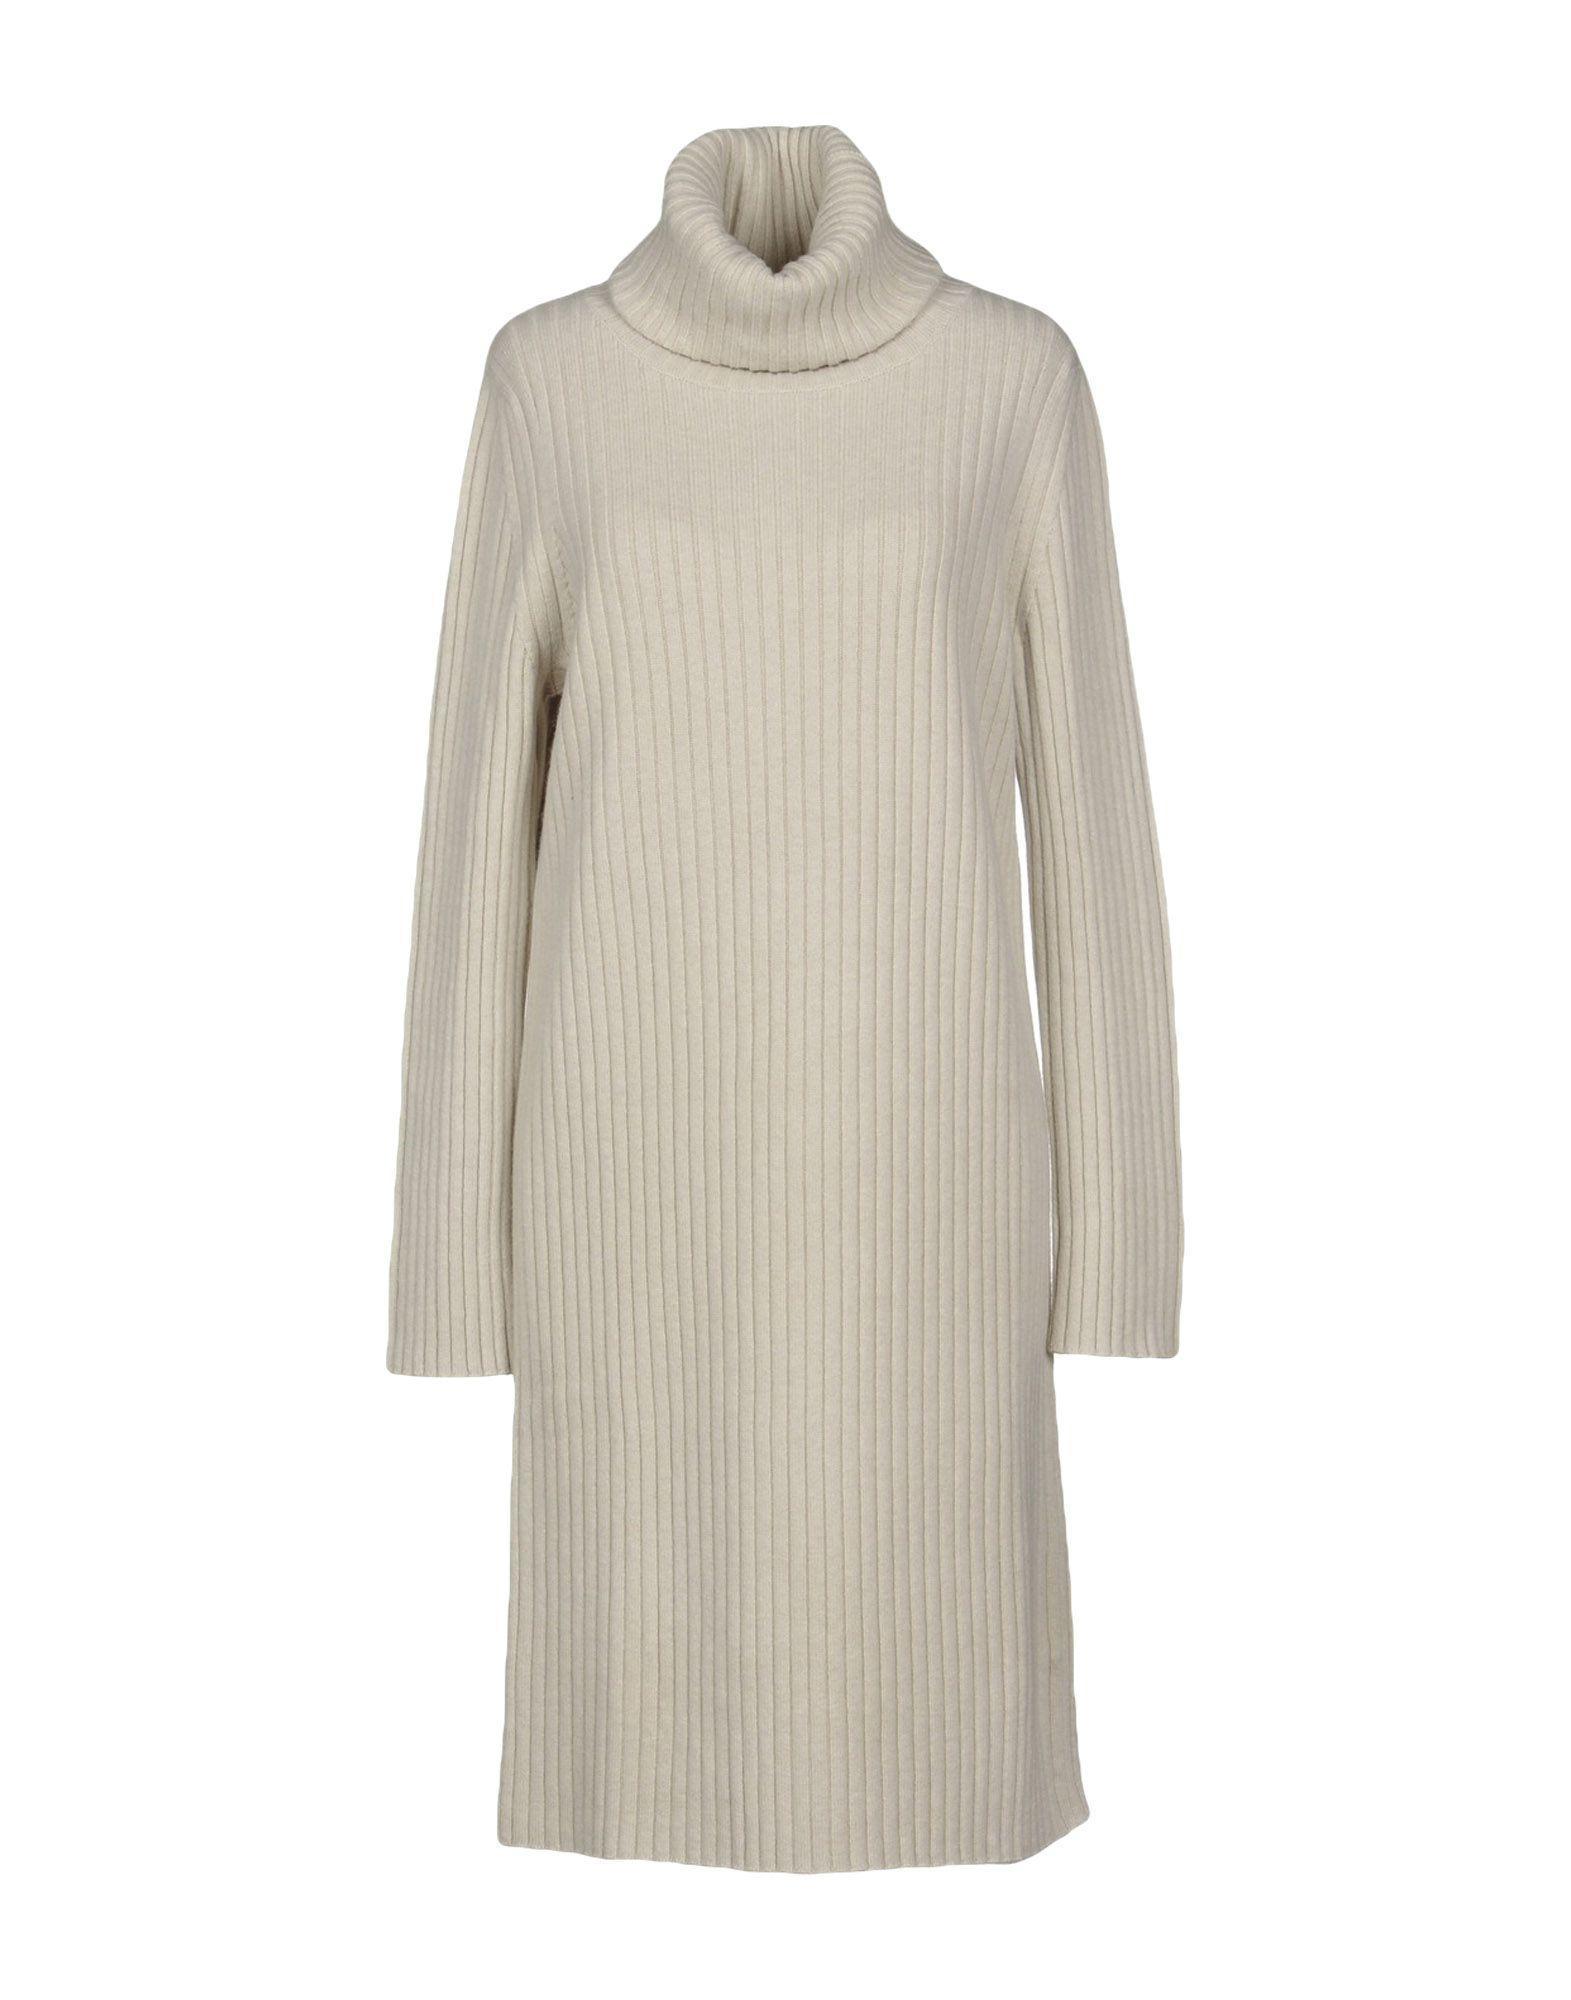 Lamberto Losani Knee-length Dress In Ivory